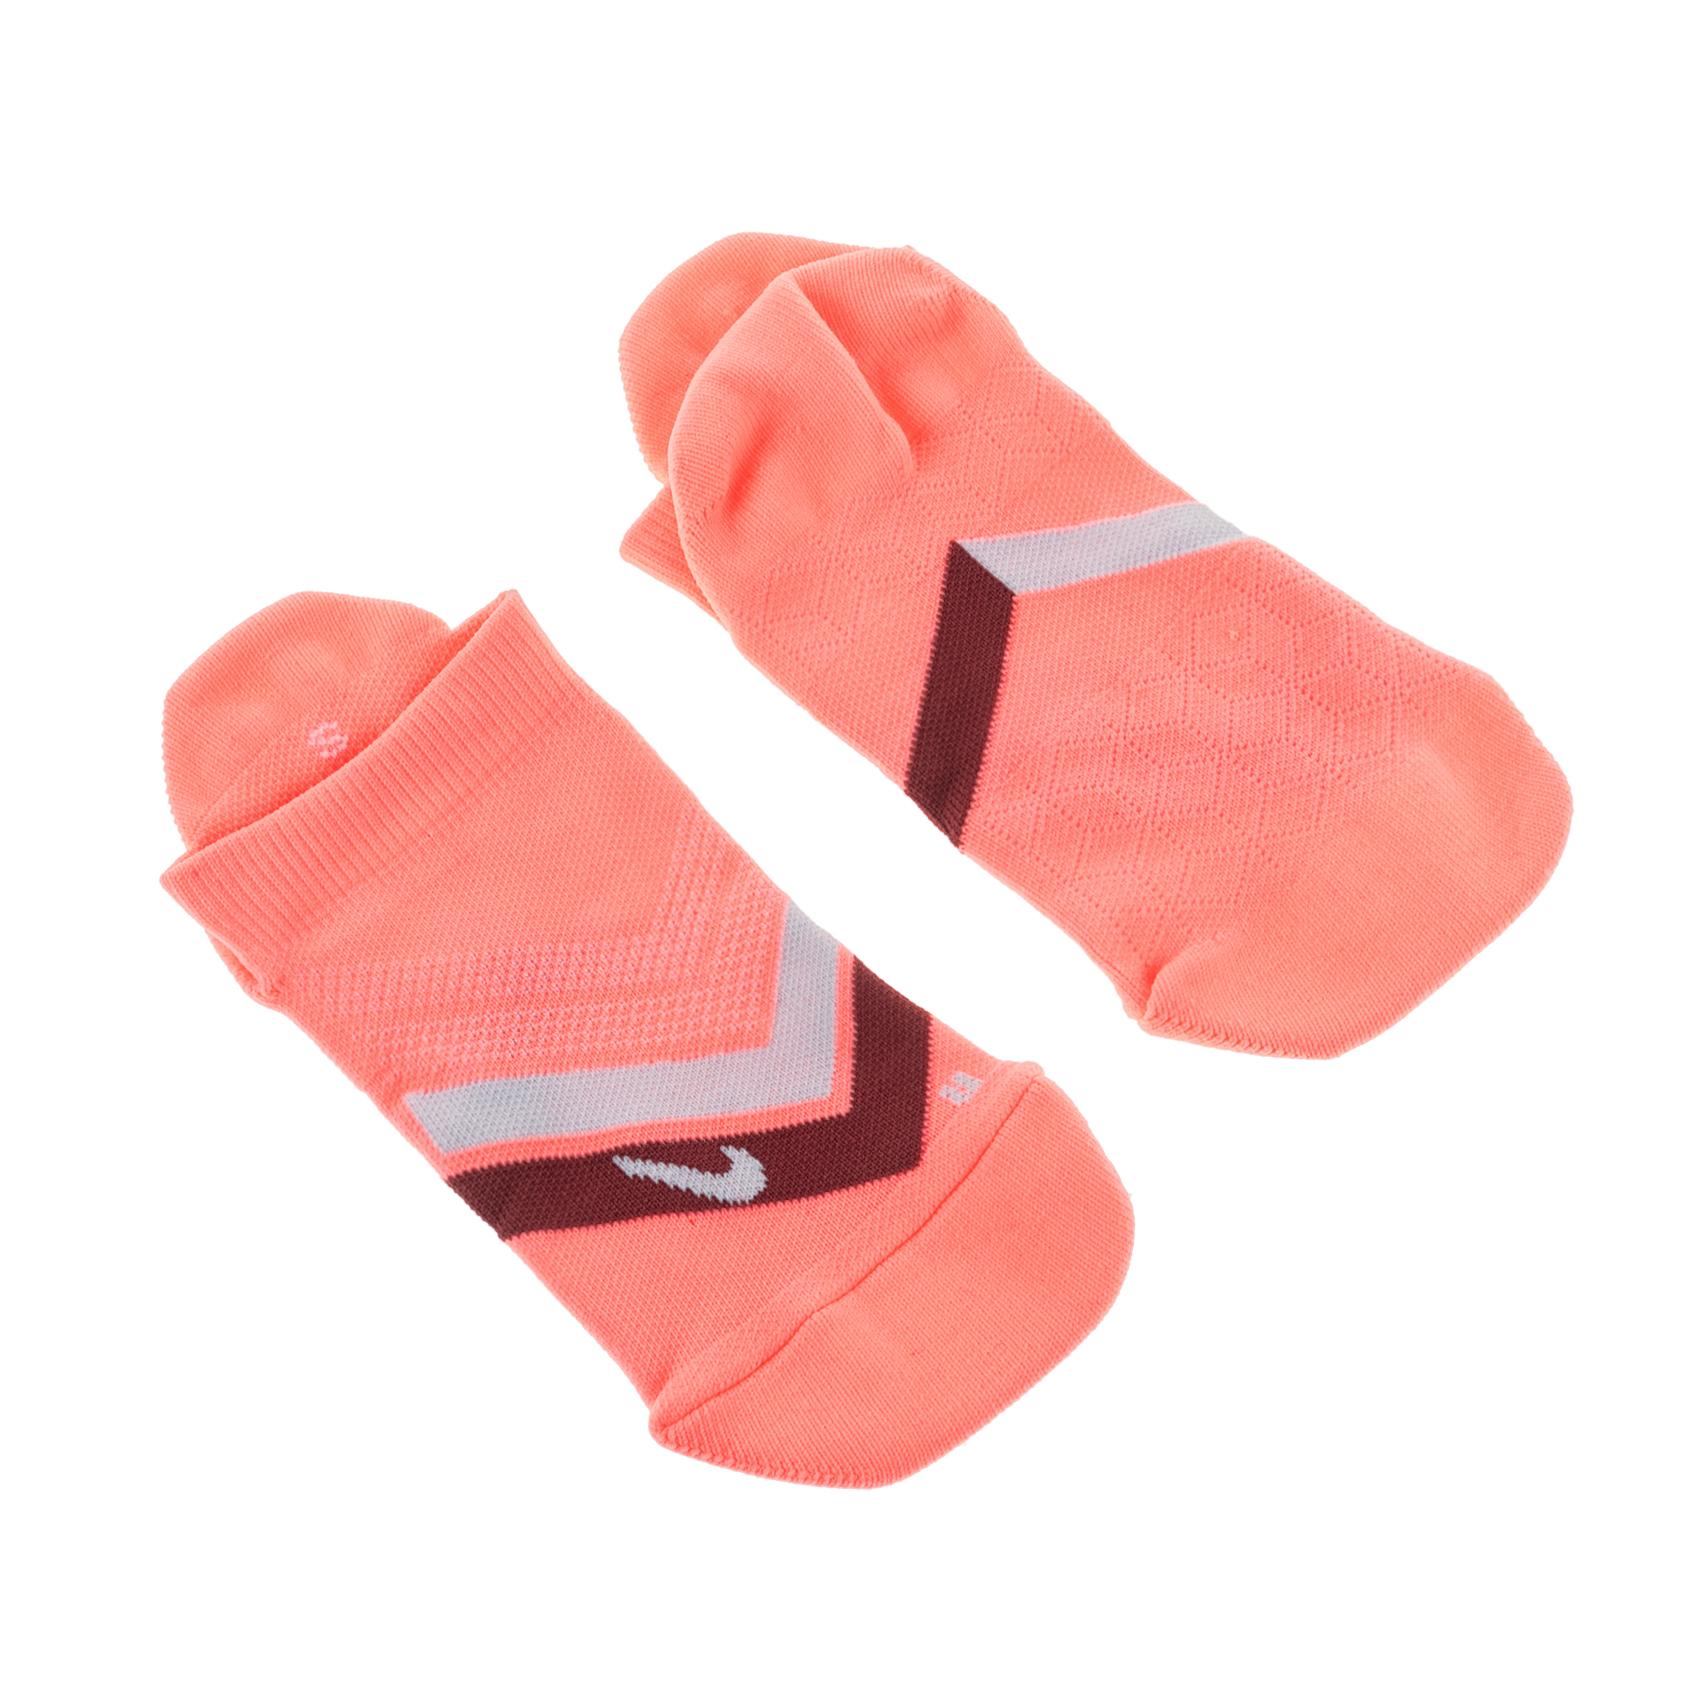 NIKE - Unisex κάλτσες Nike PERF CUSH NS-RN πορτοκαλί γυναικεία αξεσουάρ κάλτσες